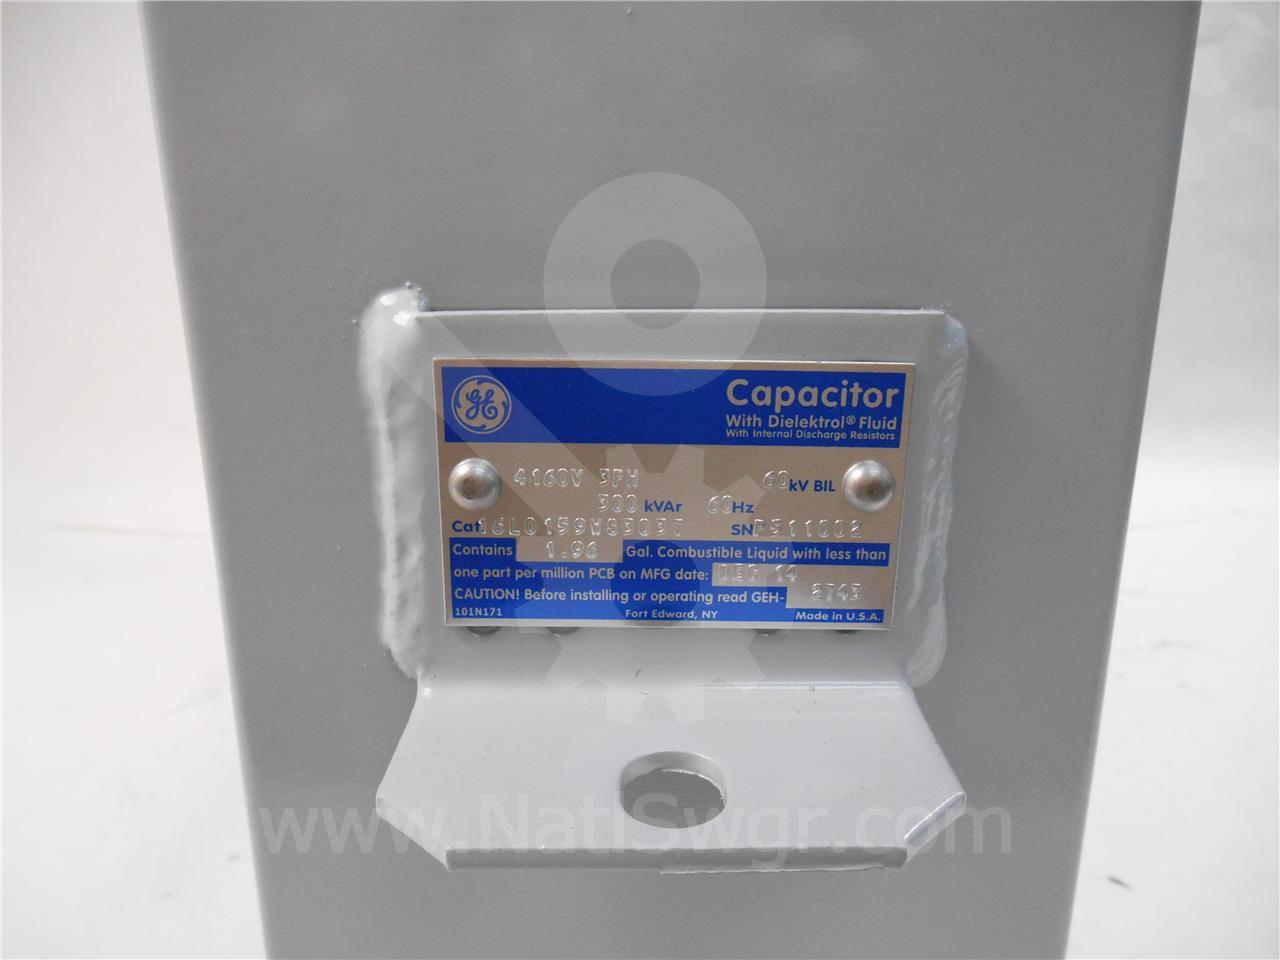 16L0159WS3037 GE / General Electric THREE PHASE CAPACITOR BANK NEW 4160V, 300KVAR, 60KV BIL